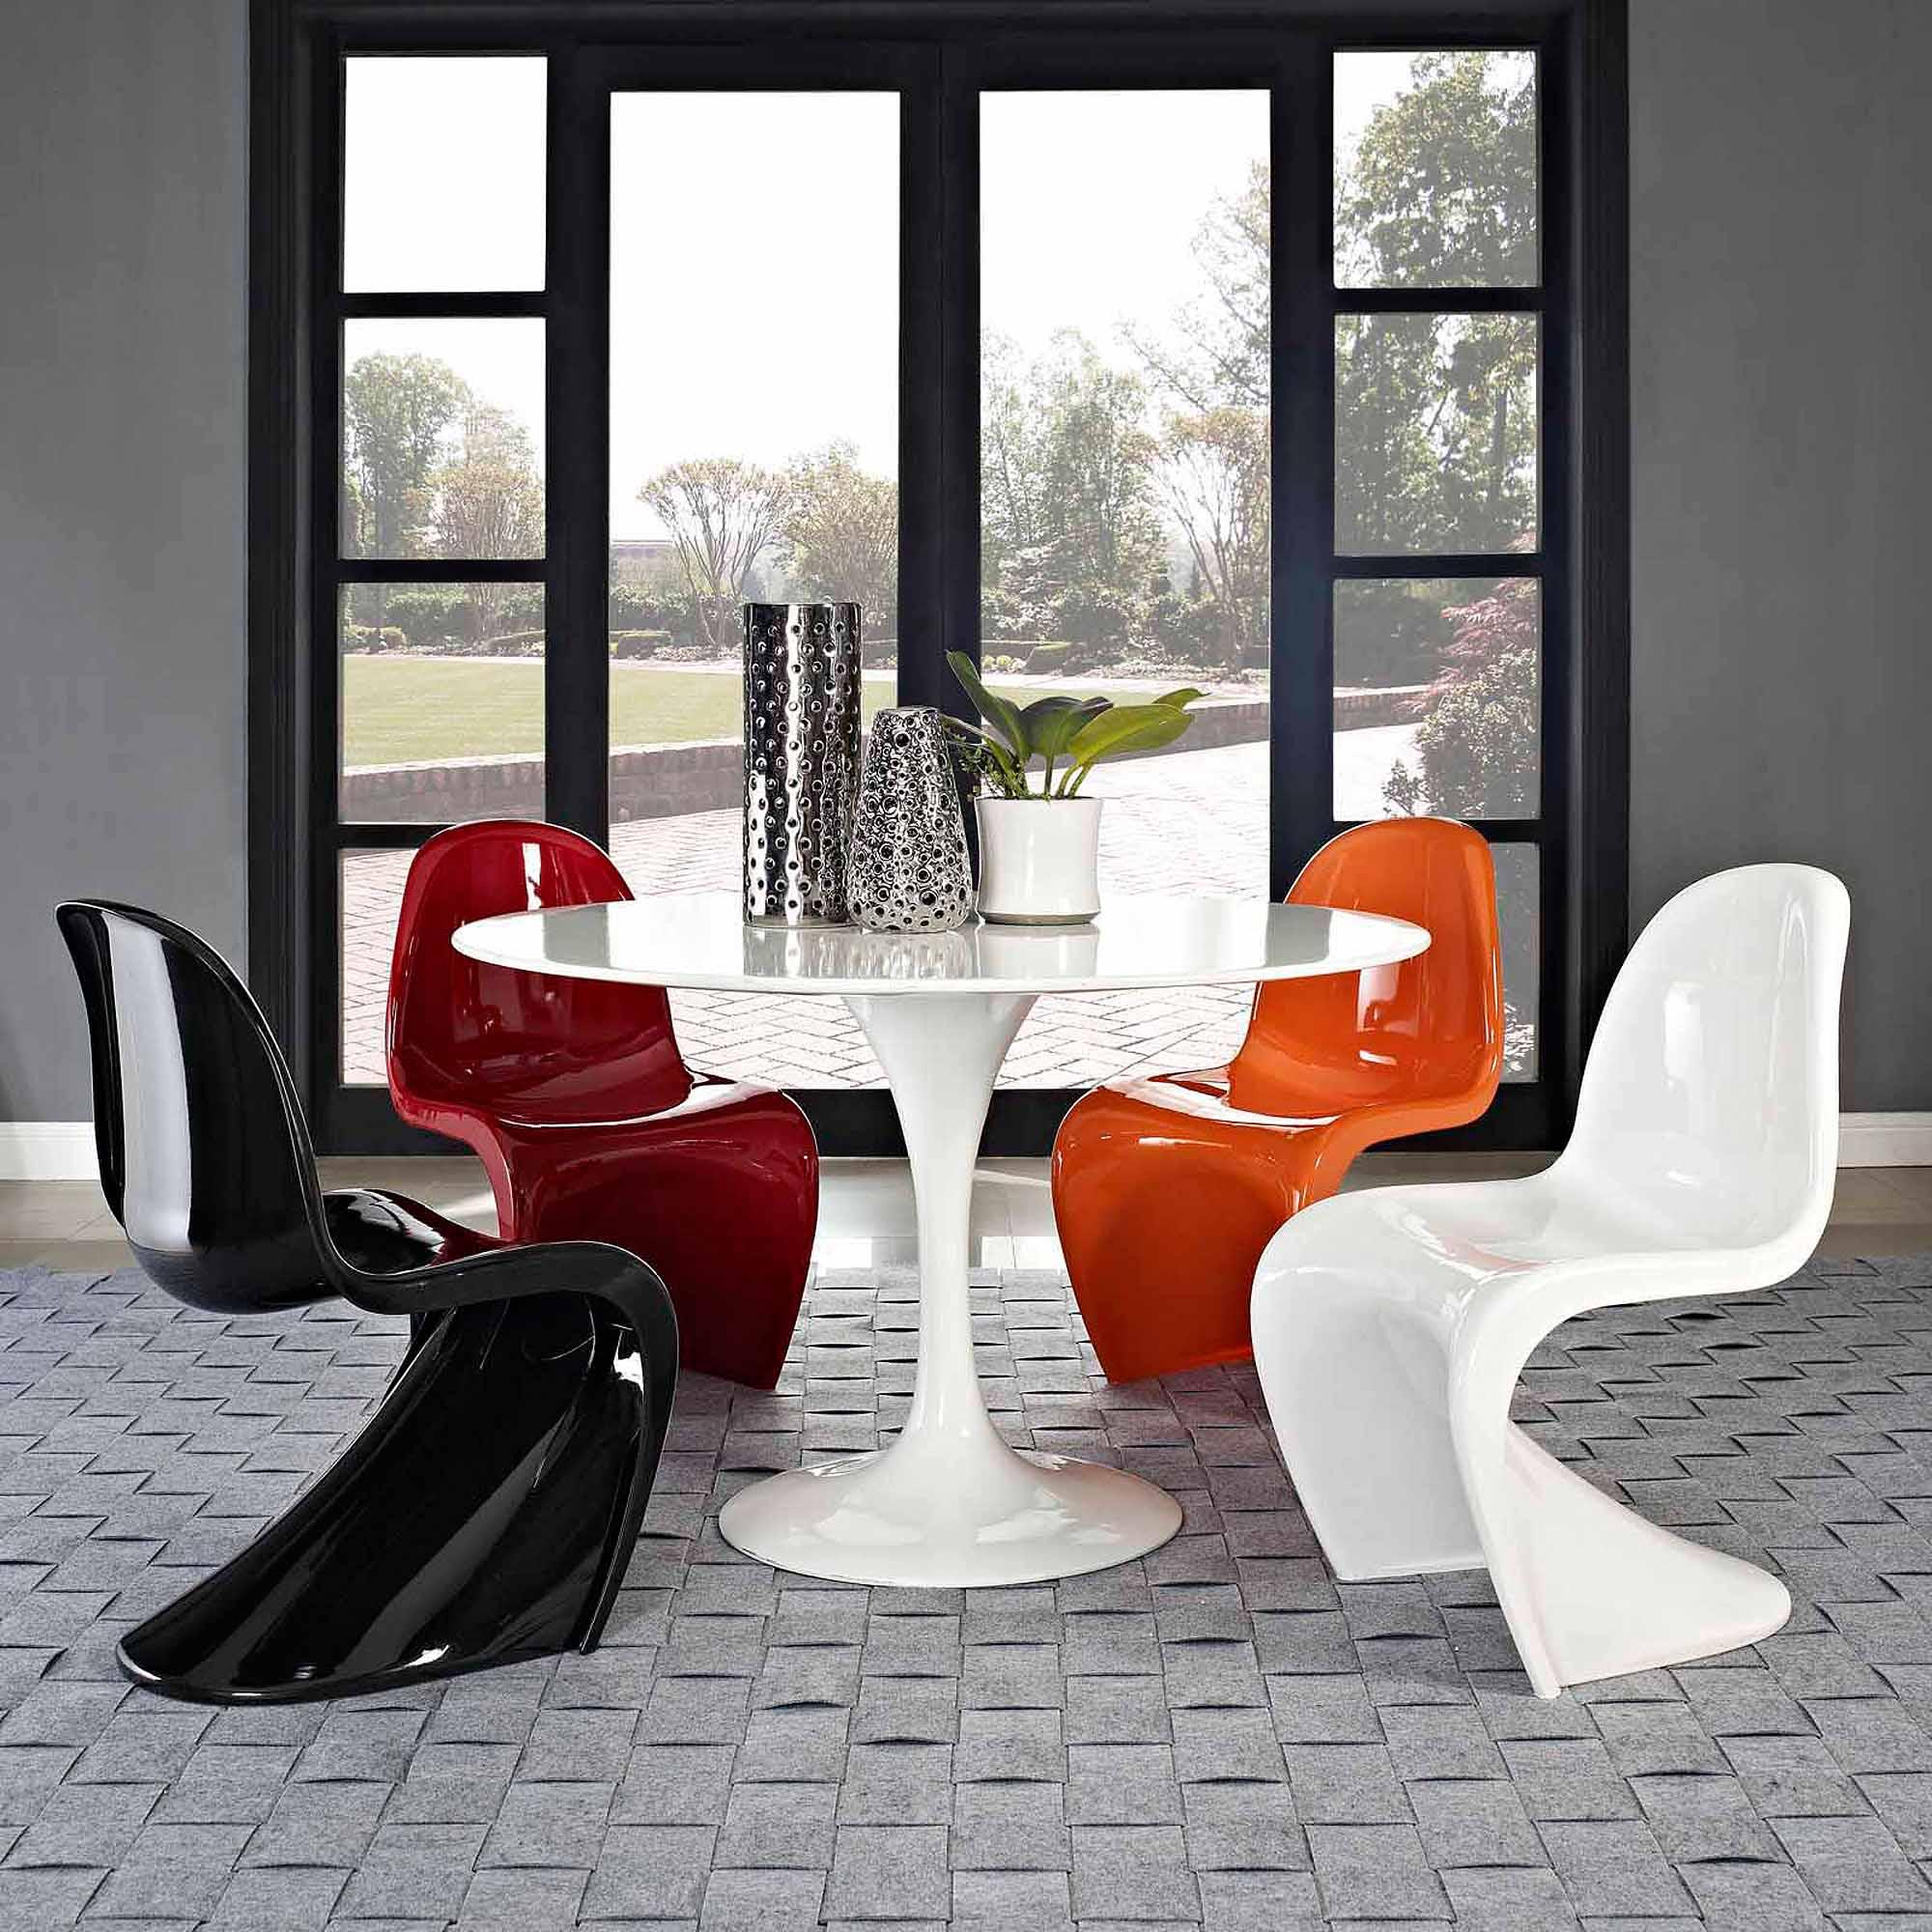 gala futons and furniture Roselawnlutheran : 93141929 cf8f 4fbb 9ef4 4da483a2a6d81e3f967433b99915c851d2bbdacd99e46 from roselawnlutheran.org size 2000 x 2000 jpeg 342kB